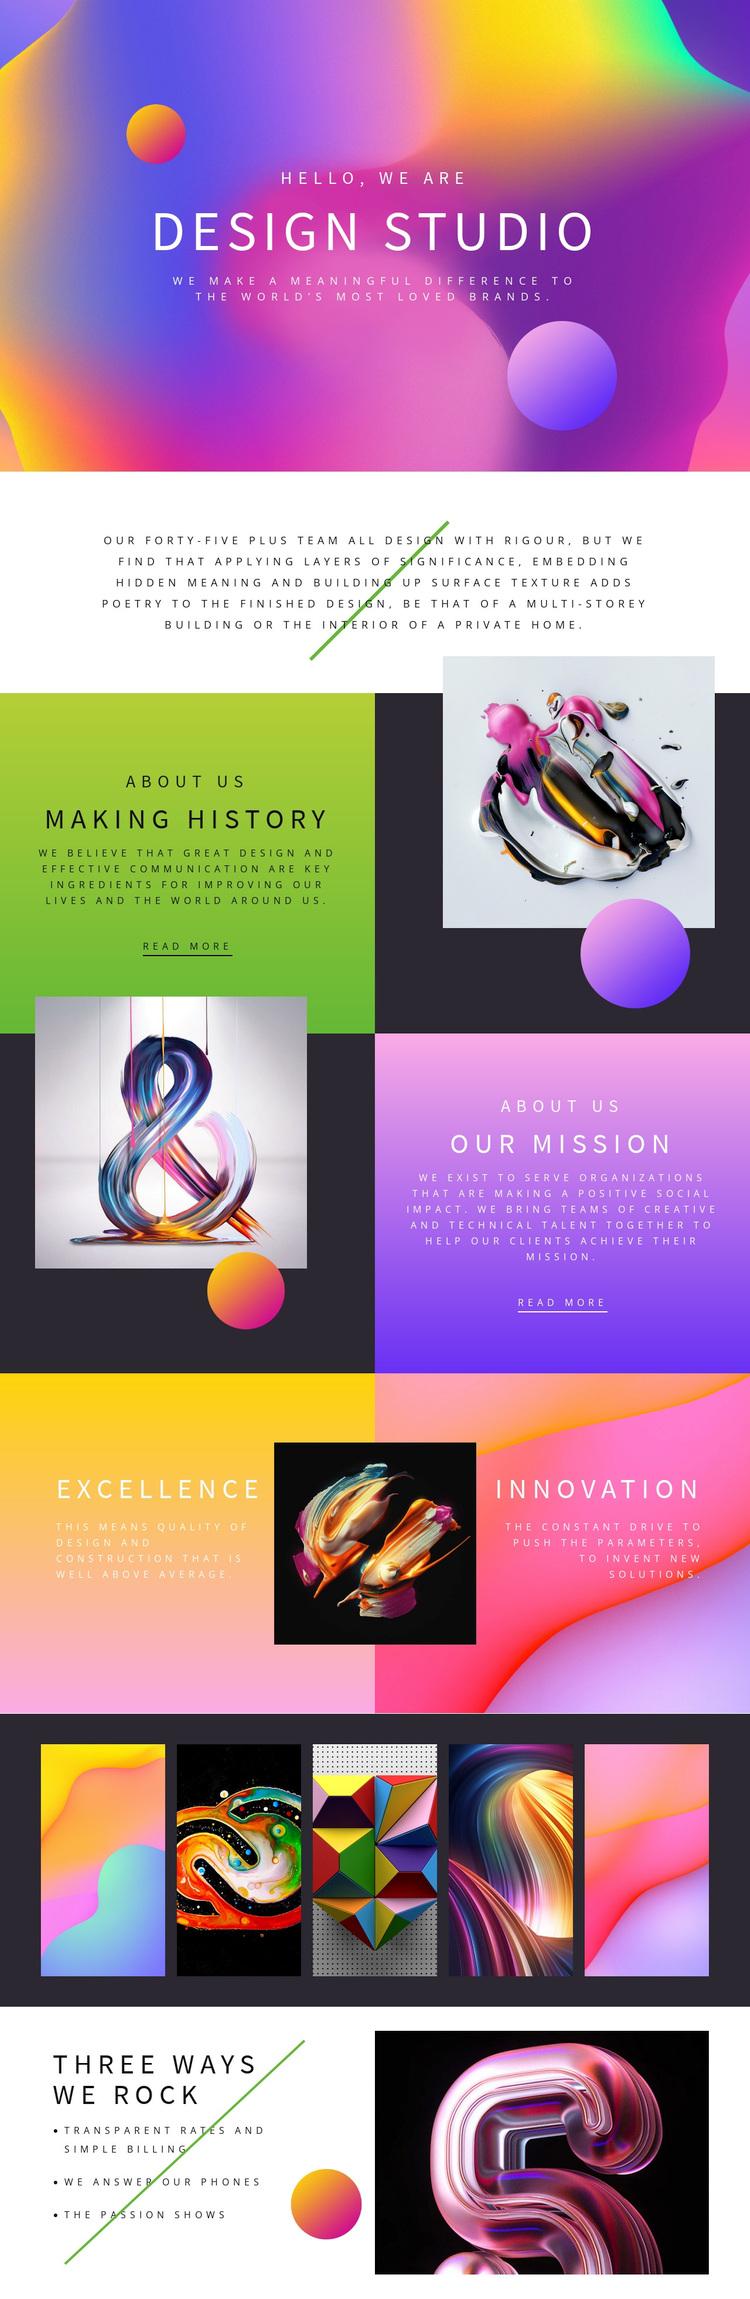 Progressive design art Template